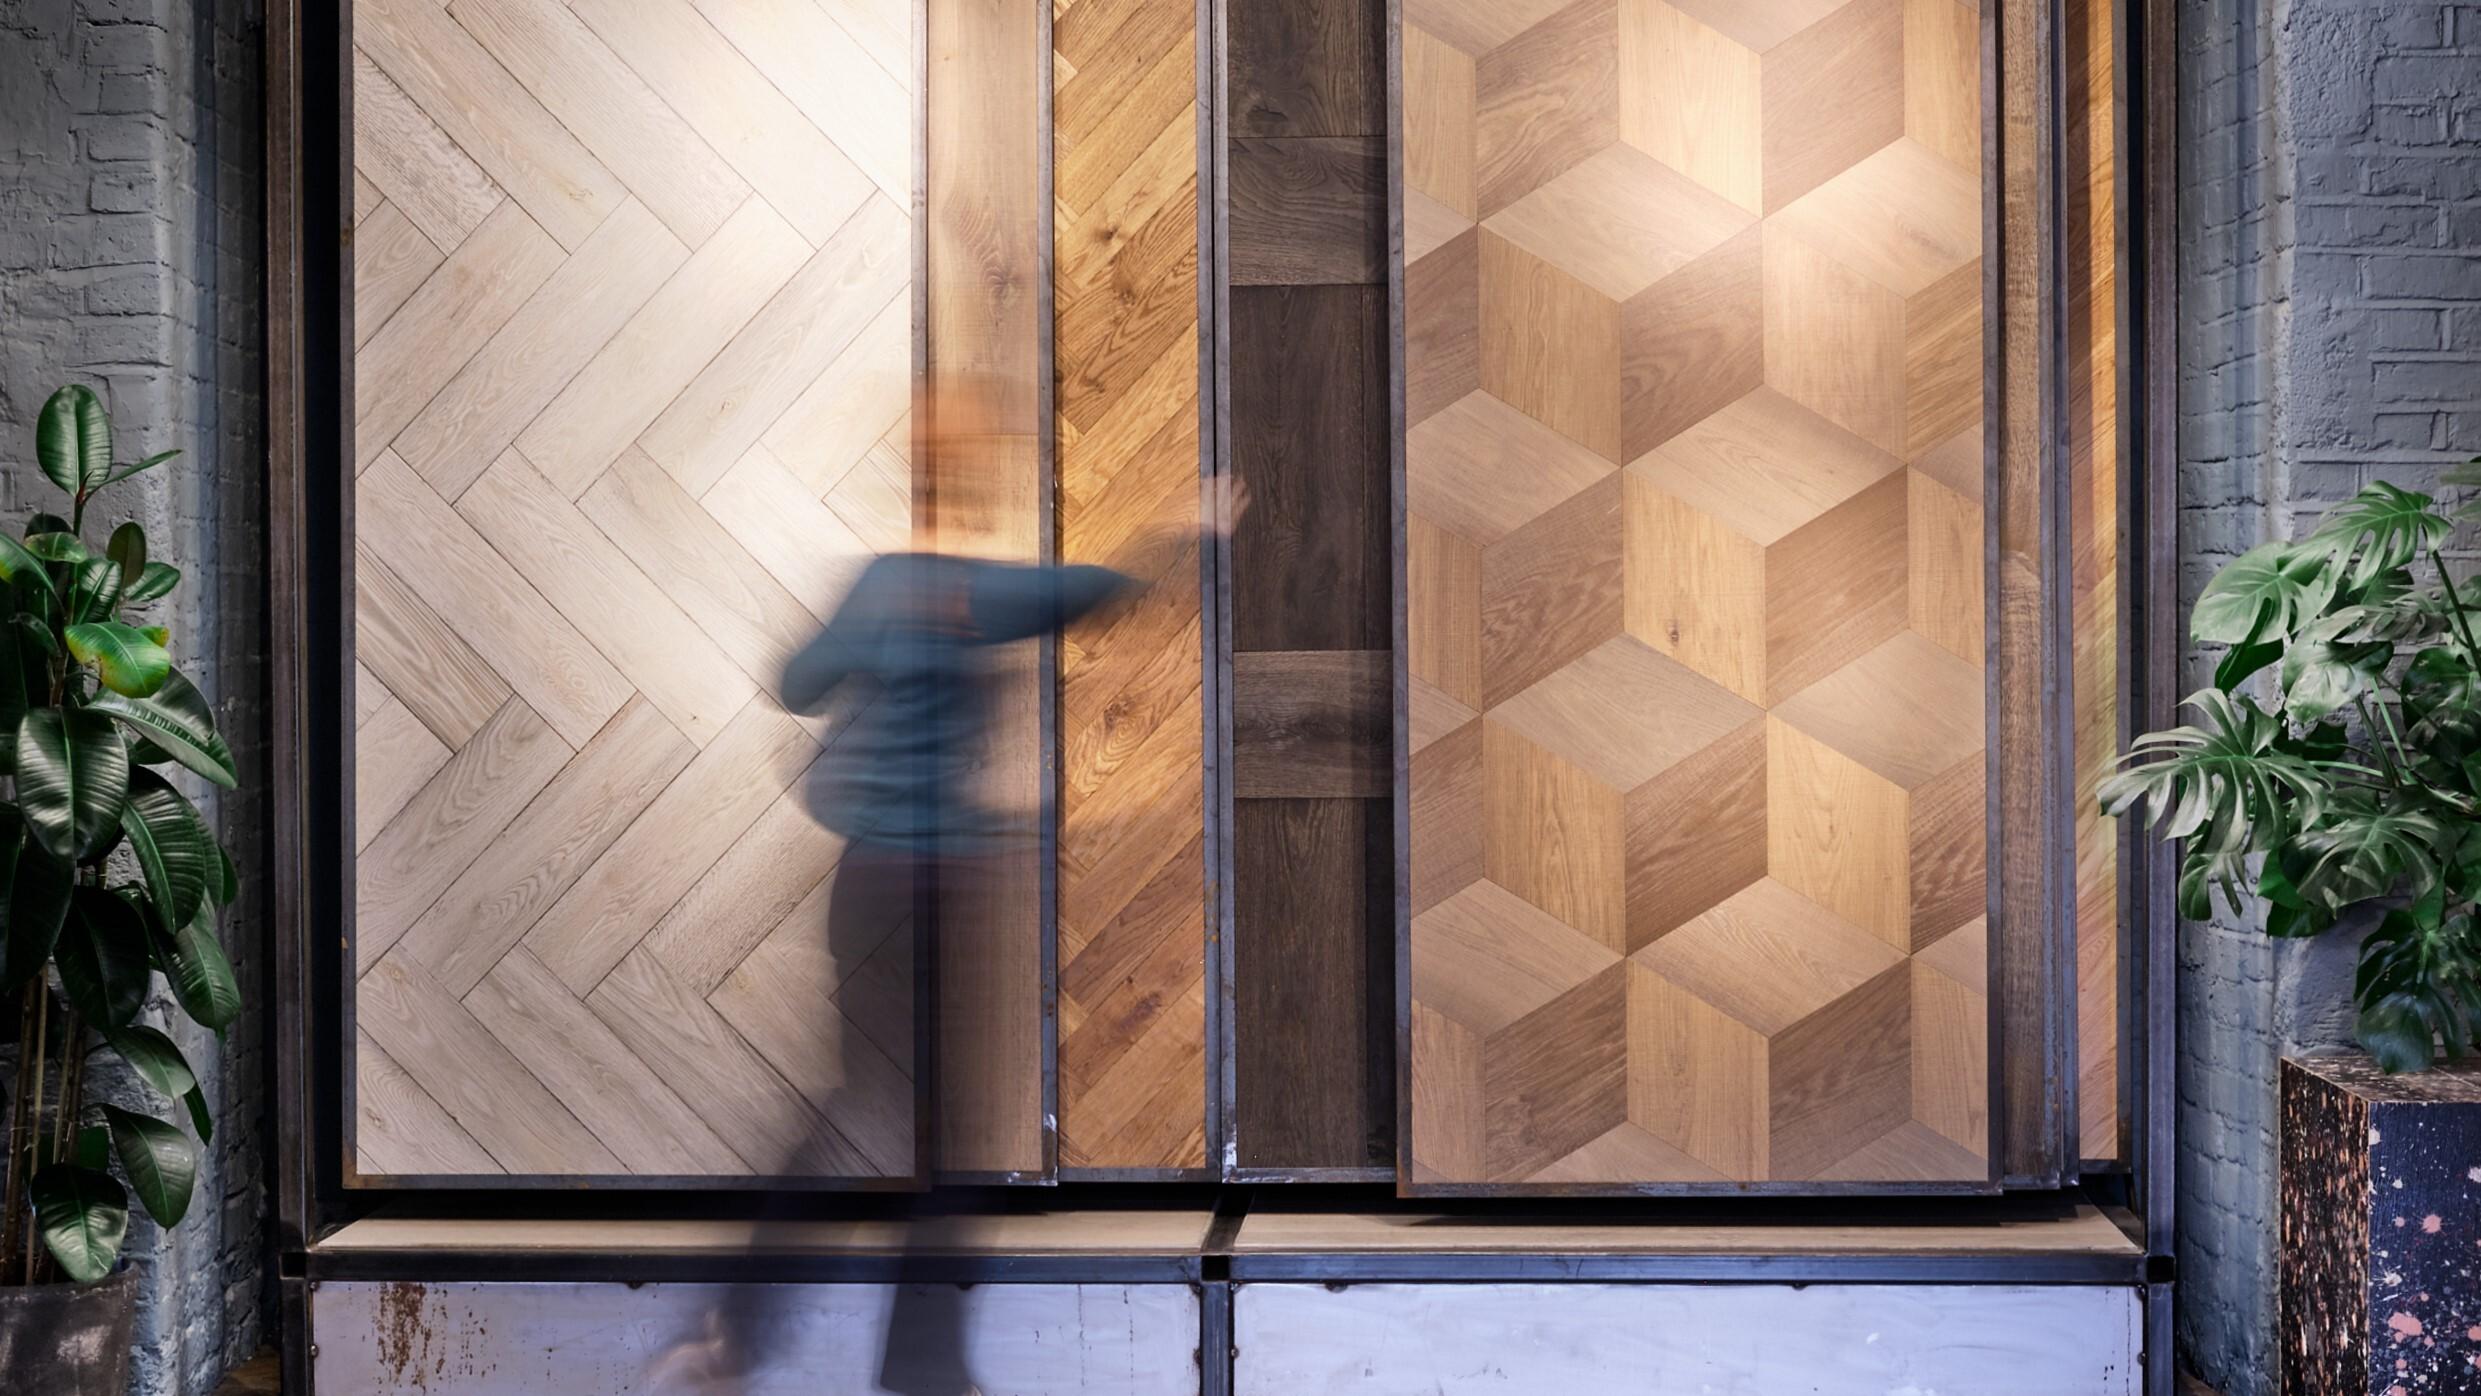 Solid Floor East showroom large hanging panels timber flooring